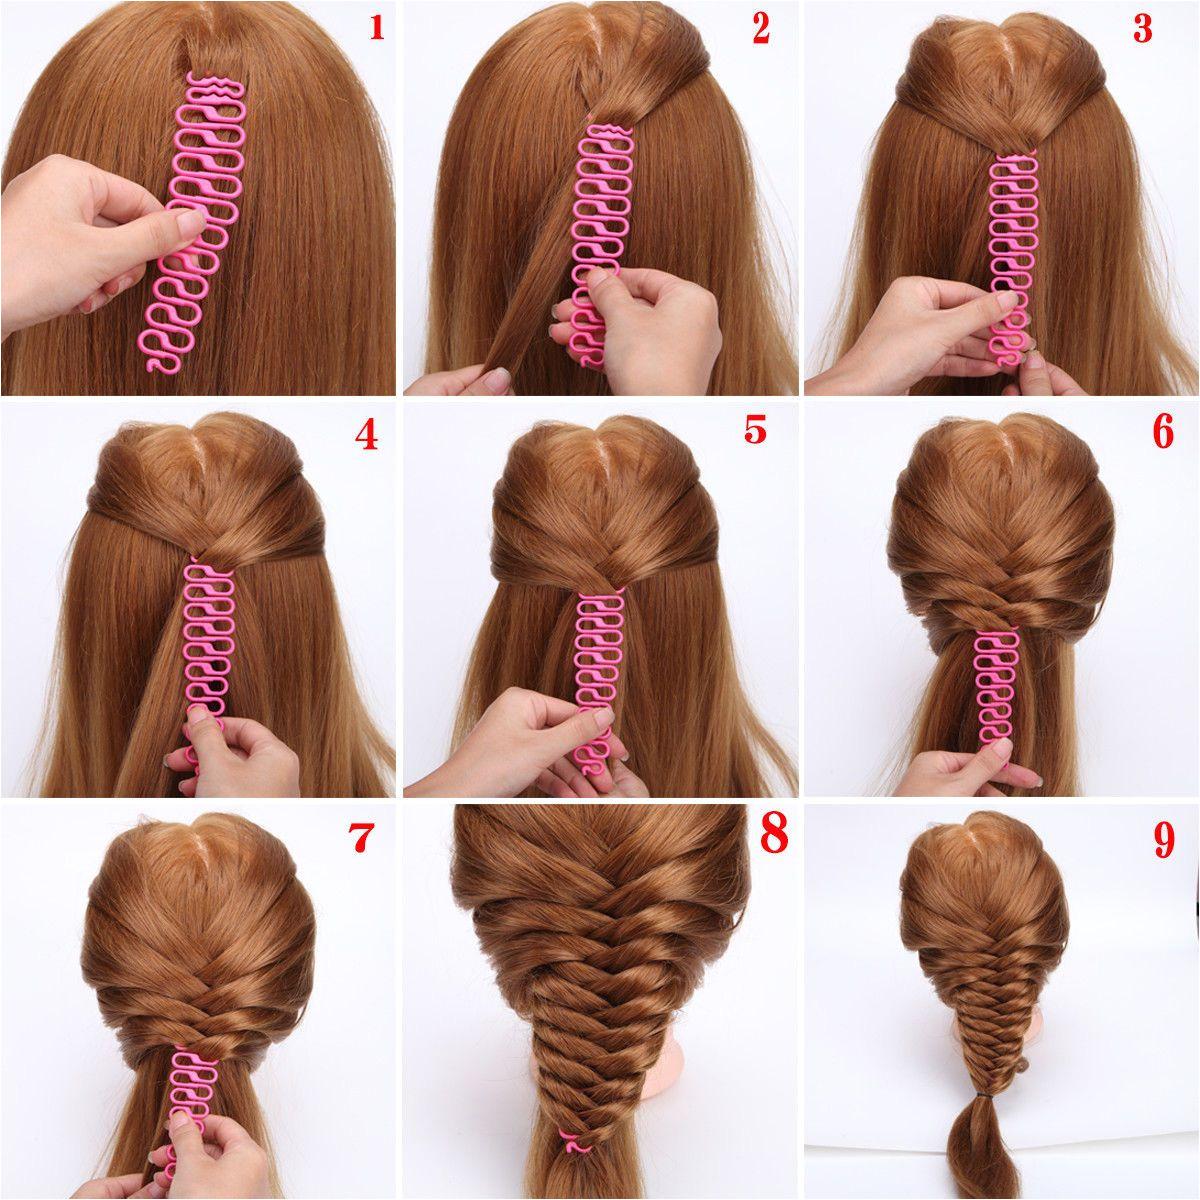 $3 99 3 Colors French Hair Braiding Tool Centipede Braider Roller Hook Twist Maker Diy ebay Fashion